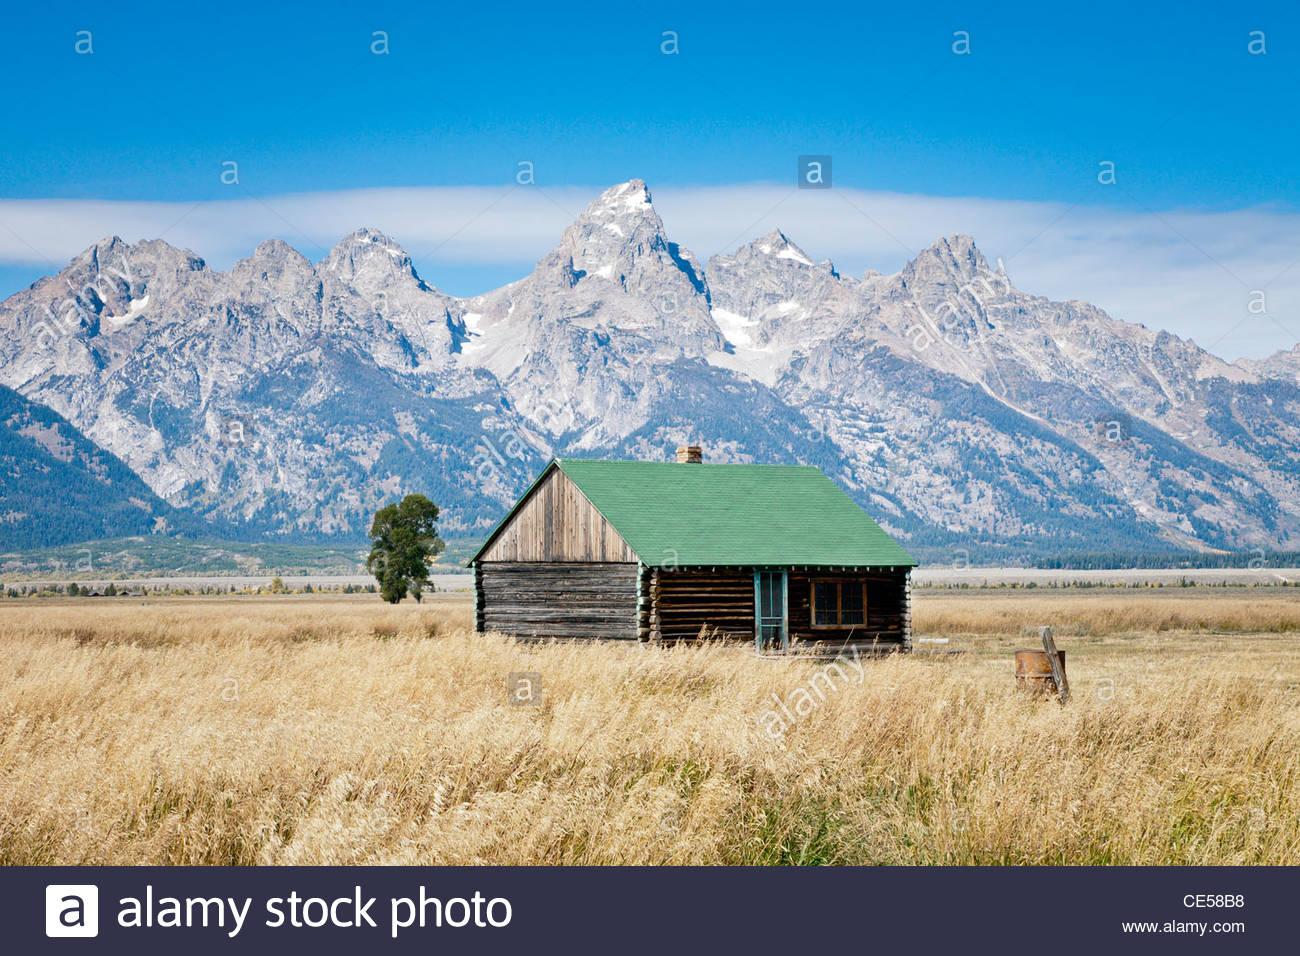 Small log cabin on Mormon Row, Antelope Flats Road, Grand Teton National Park, Wyoming, United States - Stock Image